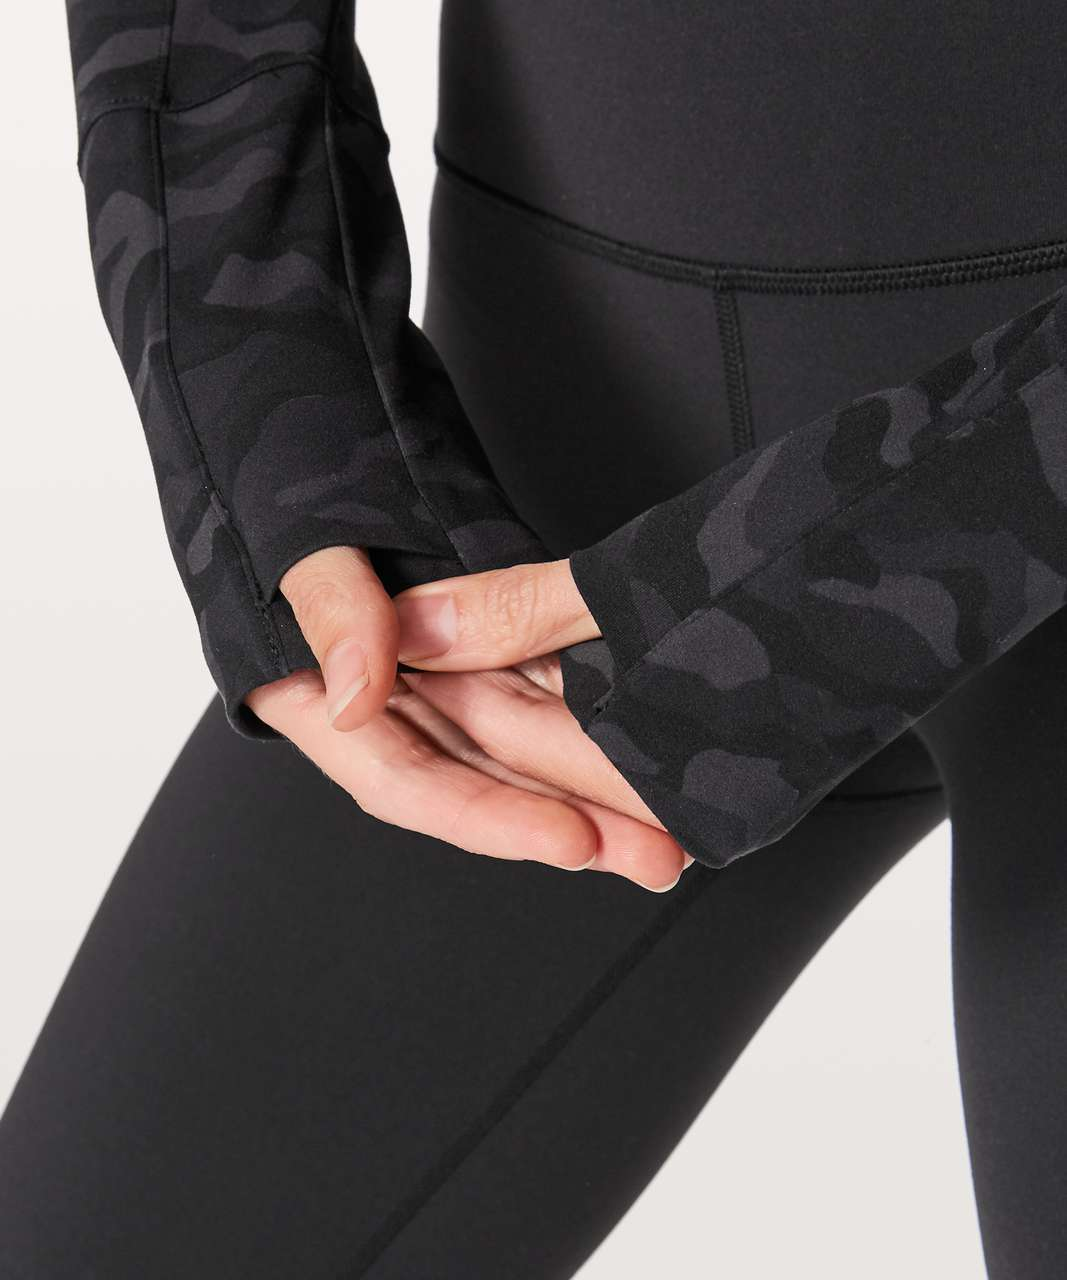 Lululemon Full Freedom Jacket - Sequoia Camo Print Deep Coal Black